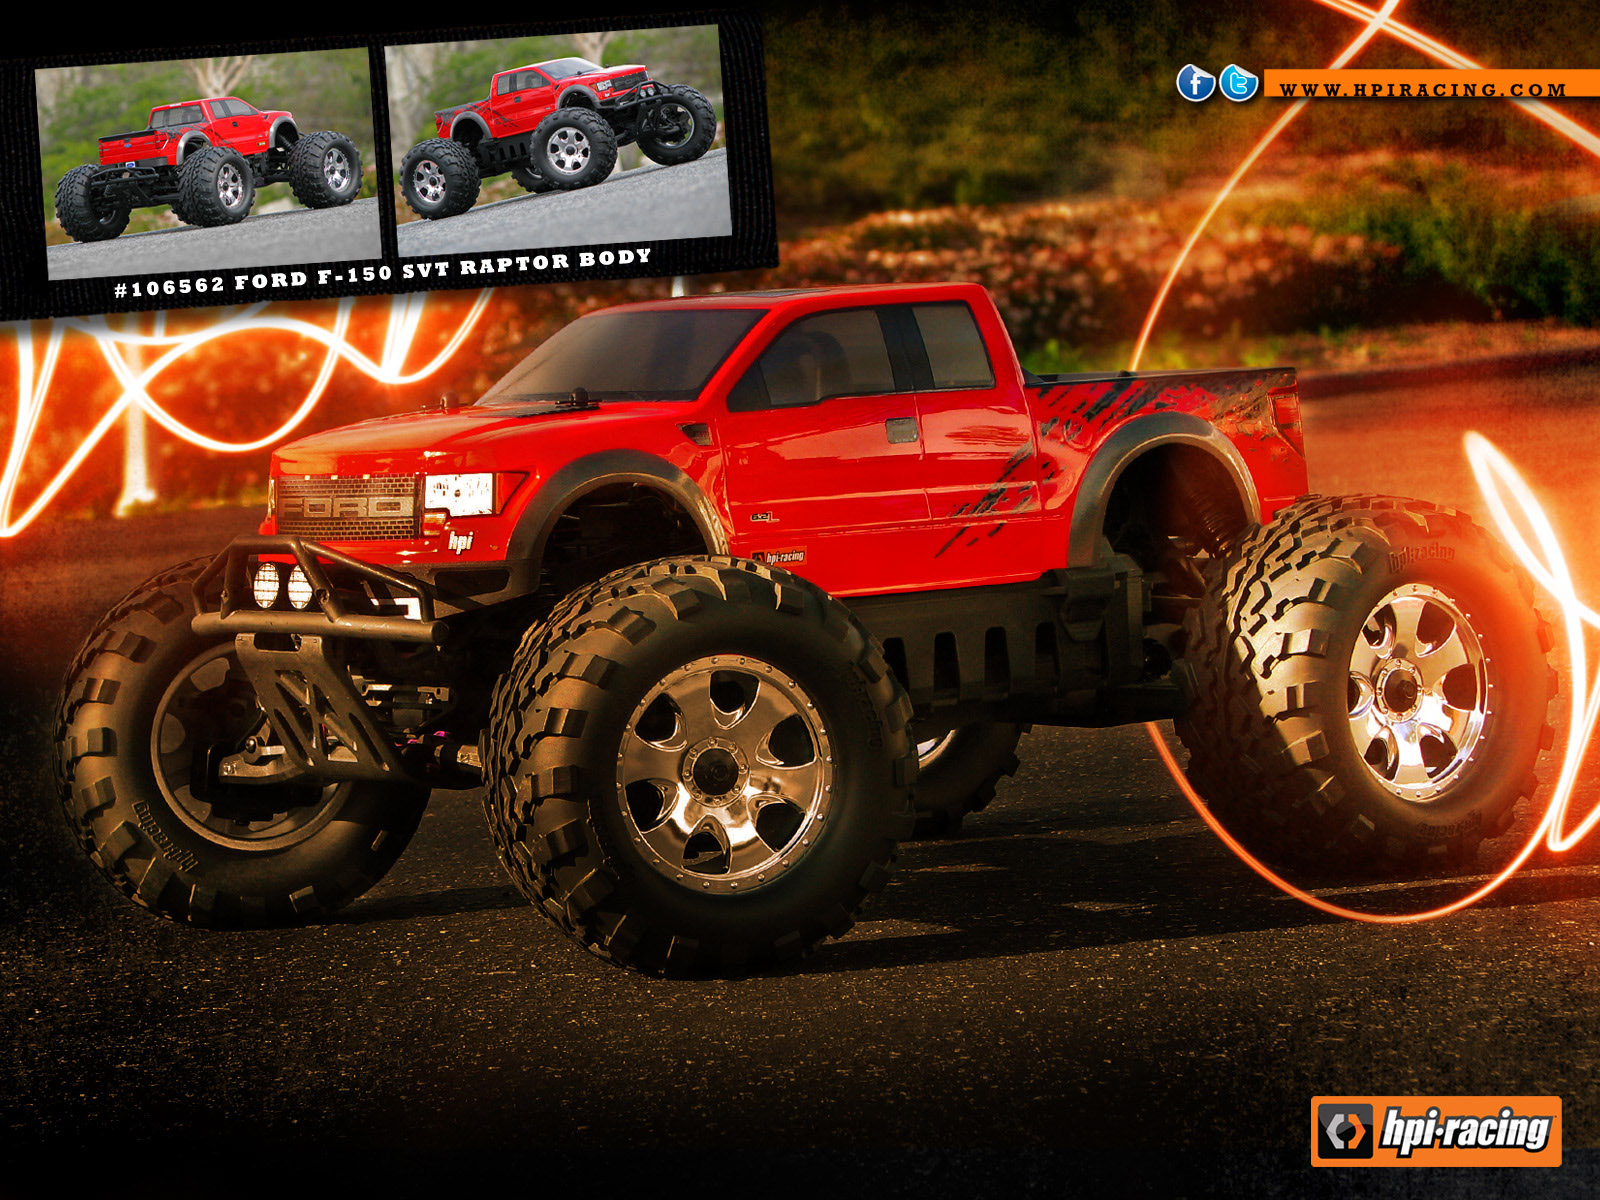 rc truck wallpaper r5 1 wallpaper xray xb9e rc buggy 1600x1200